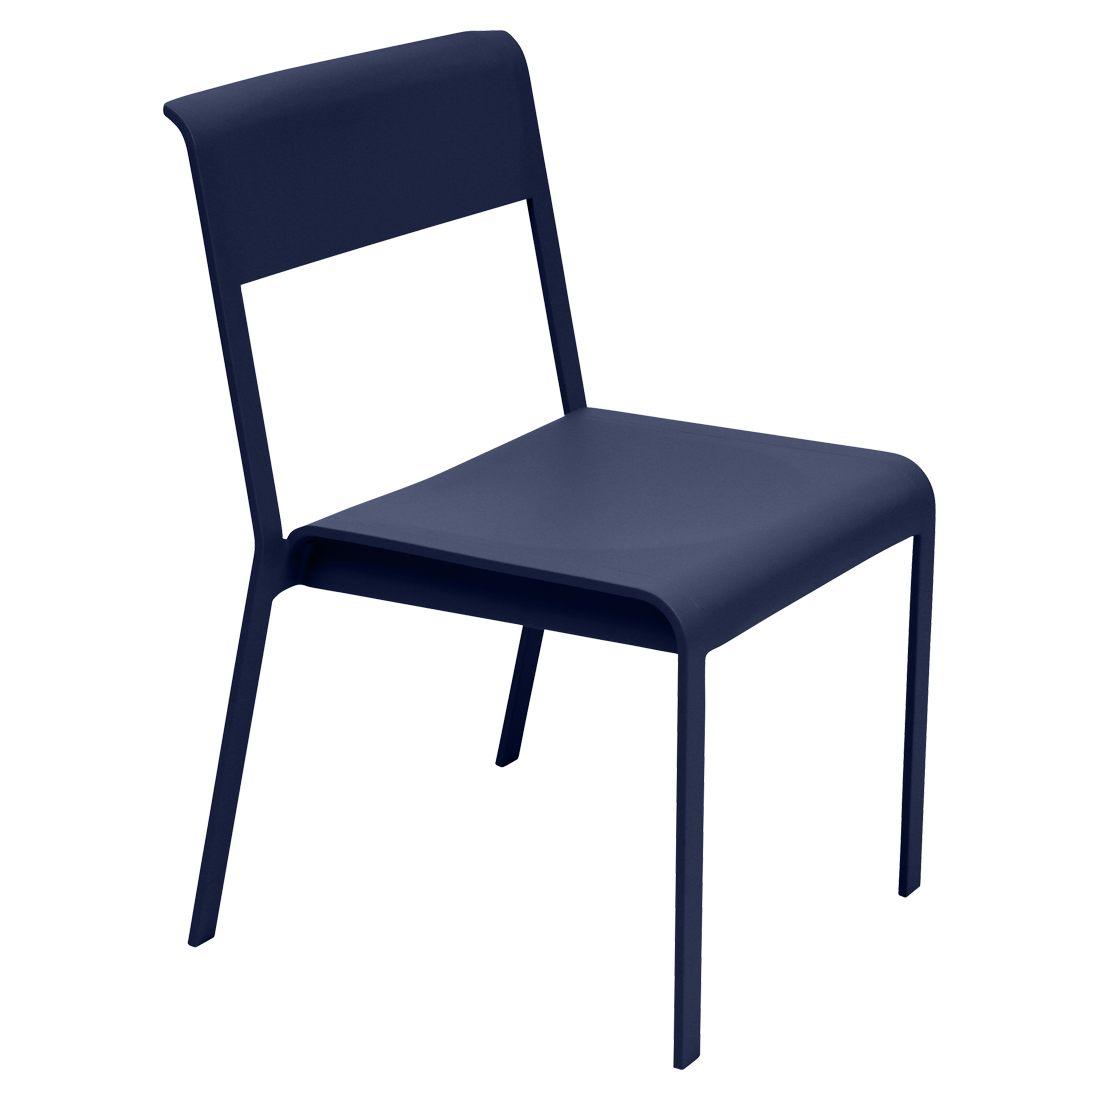 chaise metal, chaise de jardin, chaise metal design, chaise metal bleu